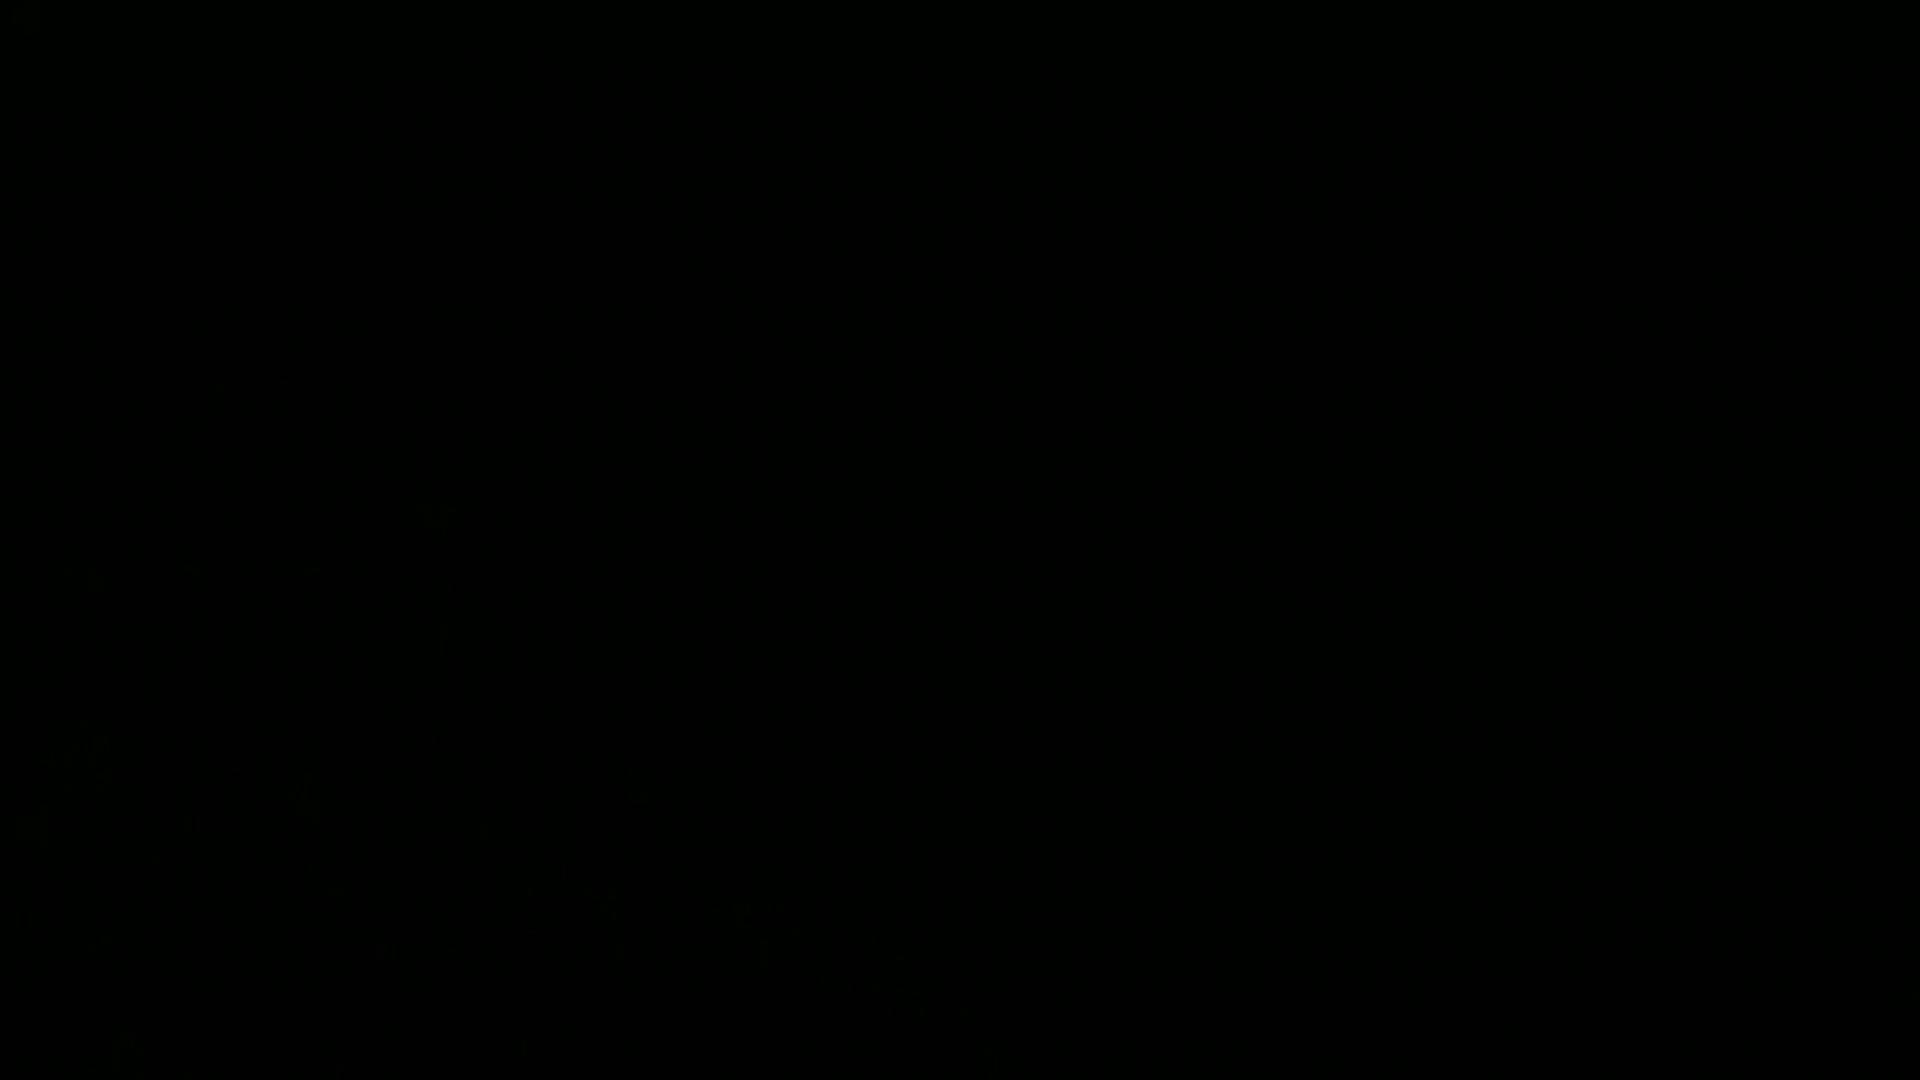 Black Screen Wallpaper...